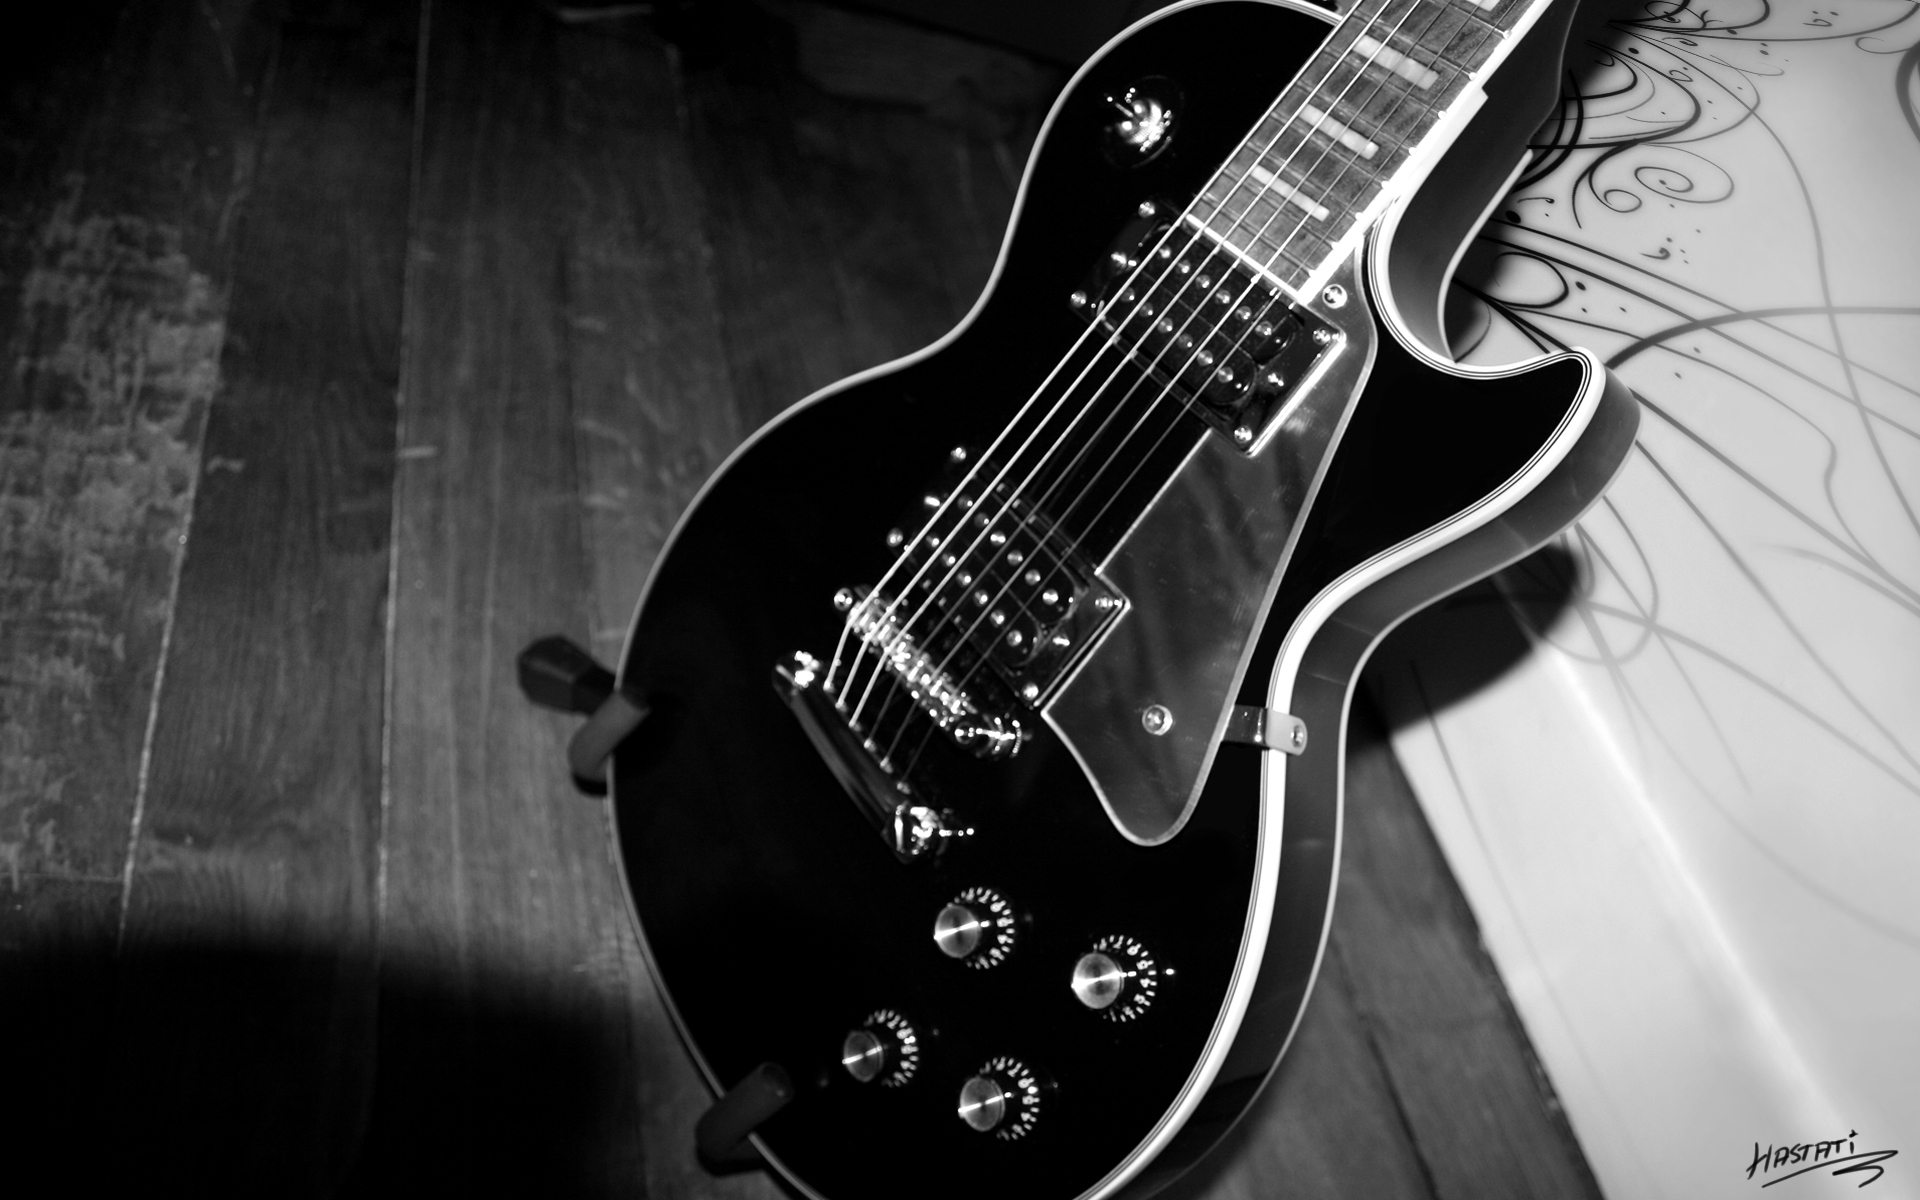 Guitar   Guitar   28014994    Fanpop fanclubs HD Wallpaper